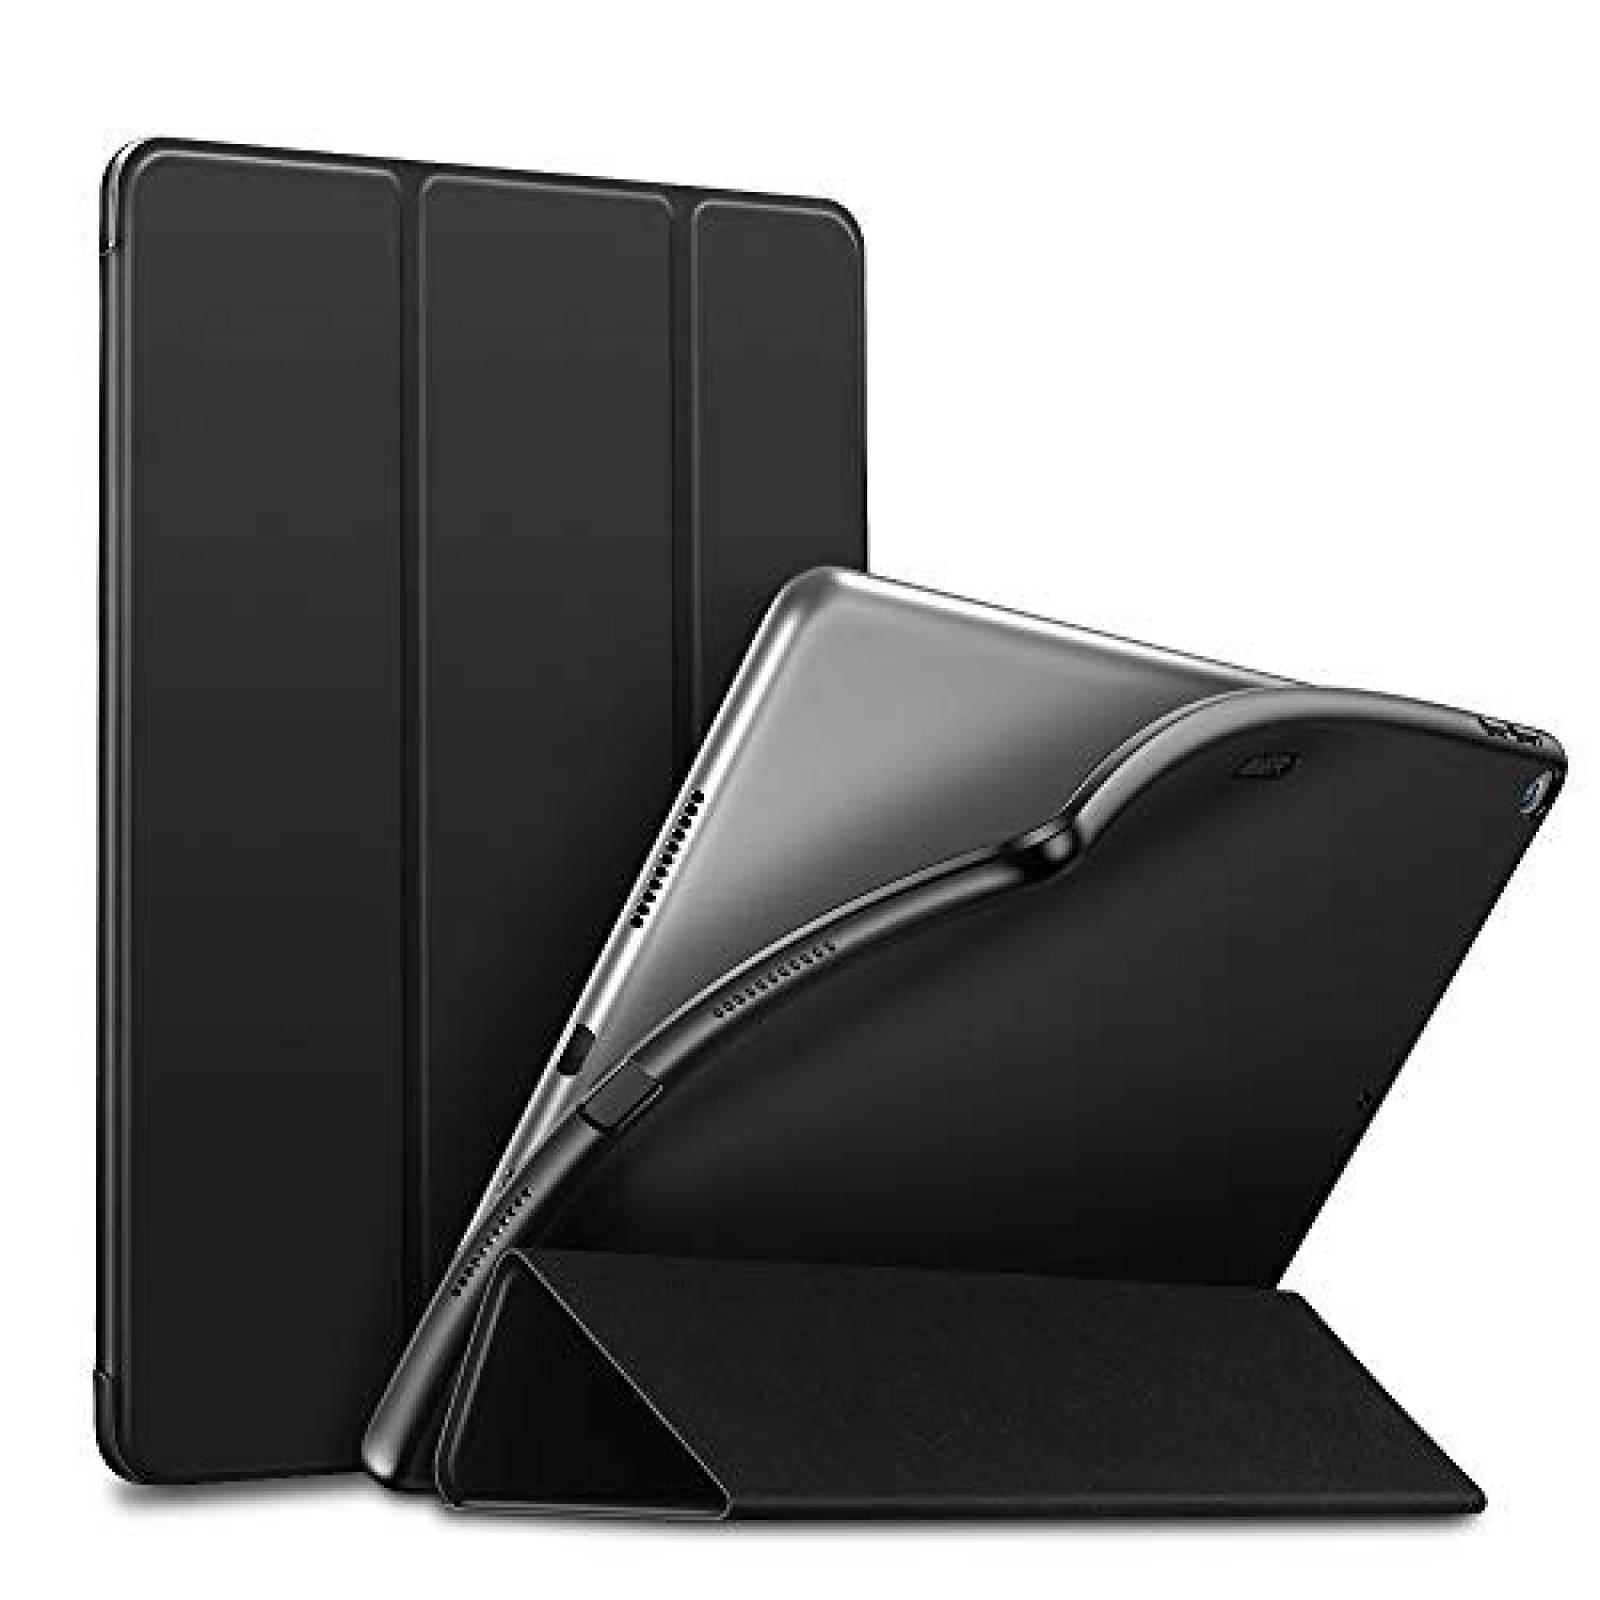 Funda ESR Rebound iPad Air 3 10.5'' 2019 TPU -Negro